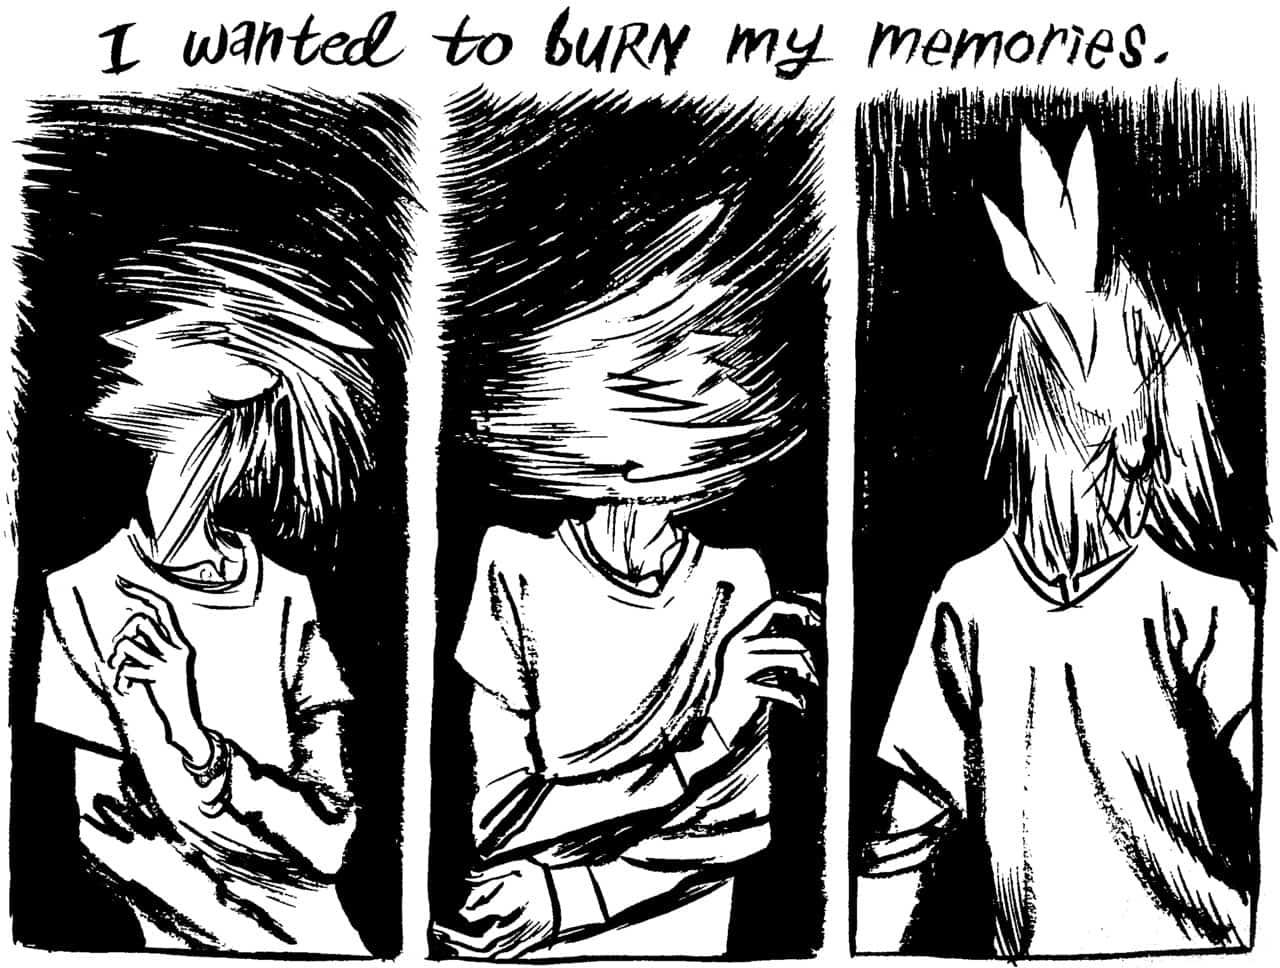 graphic memoirs